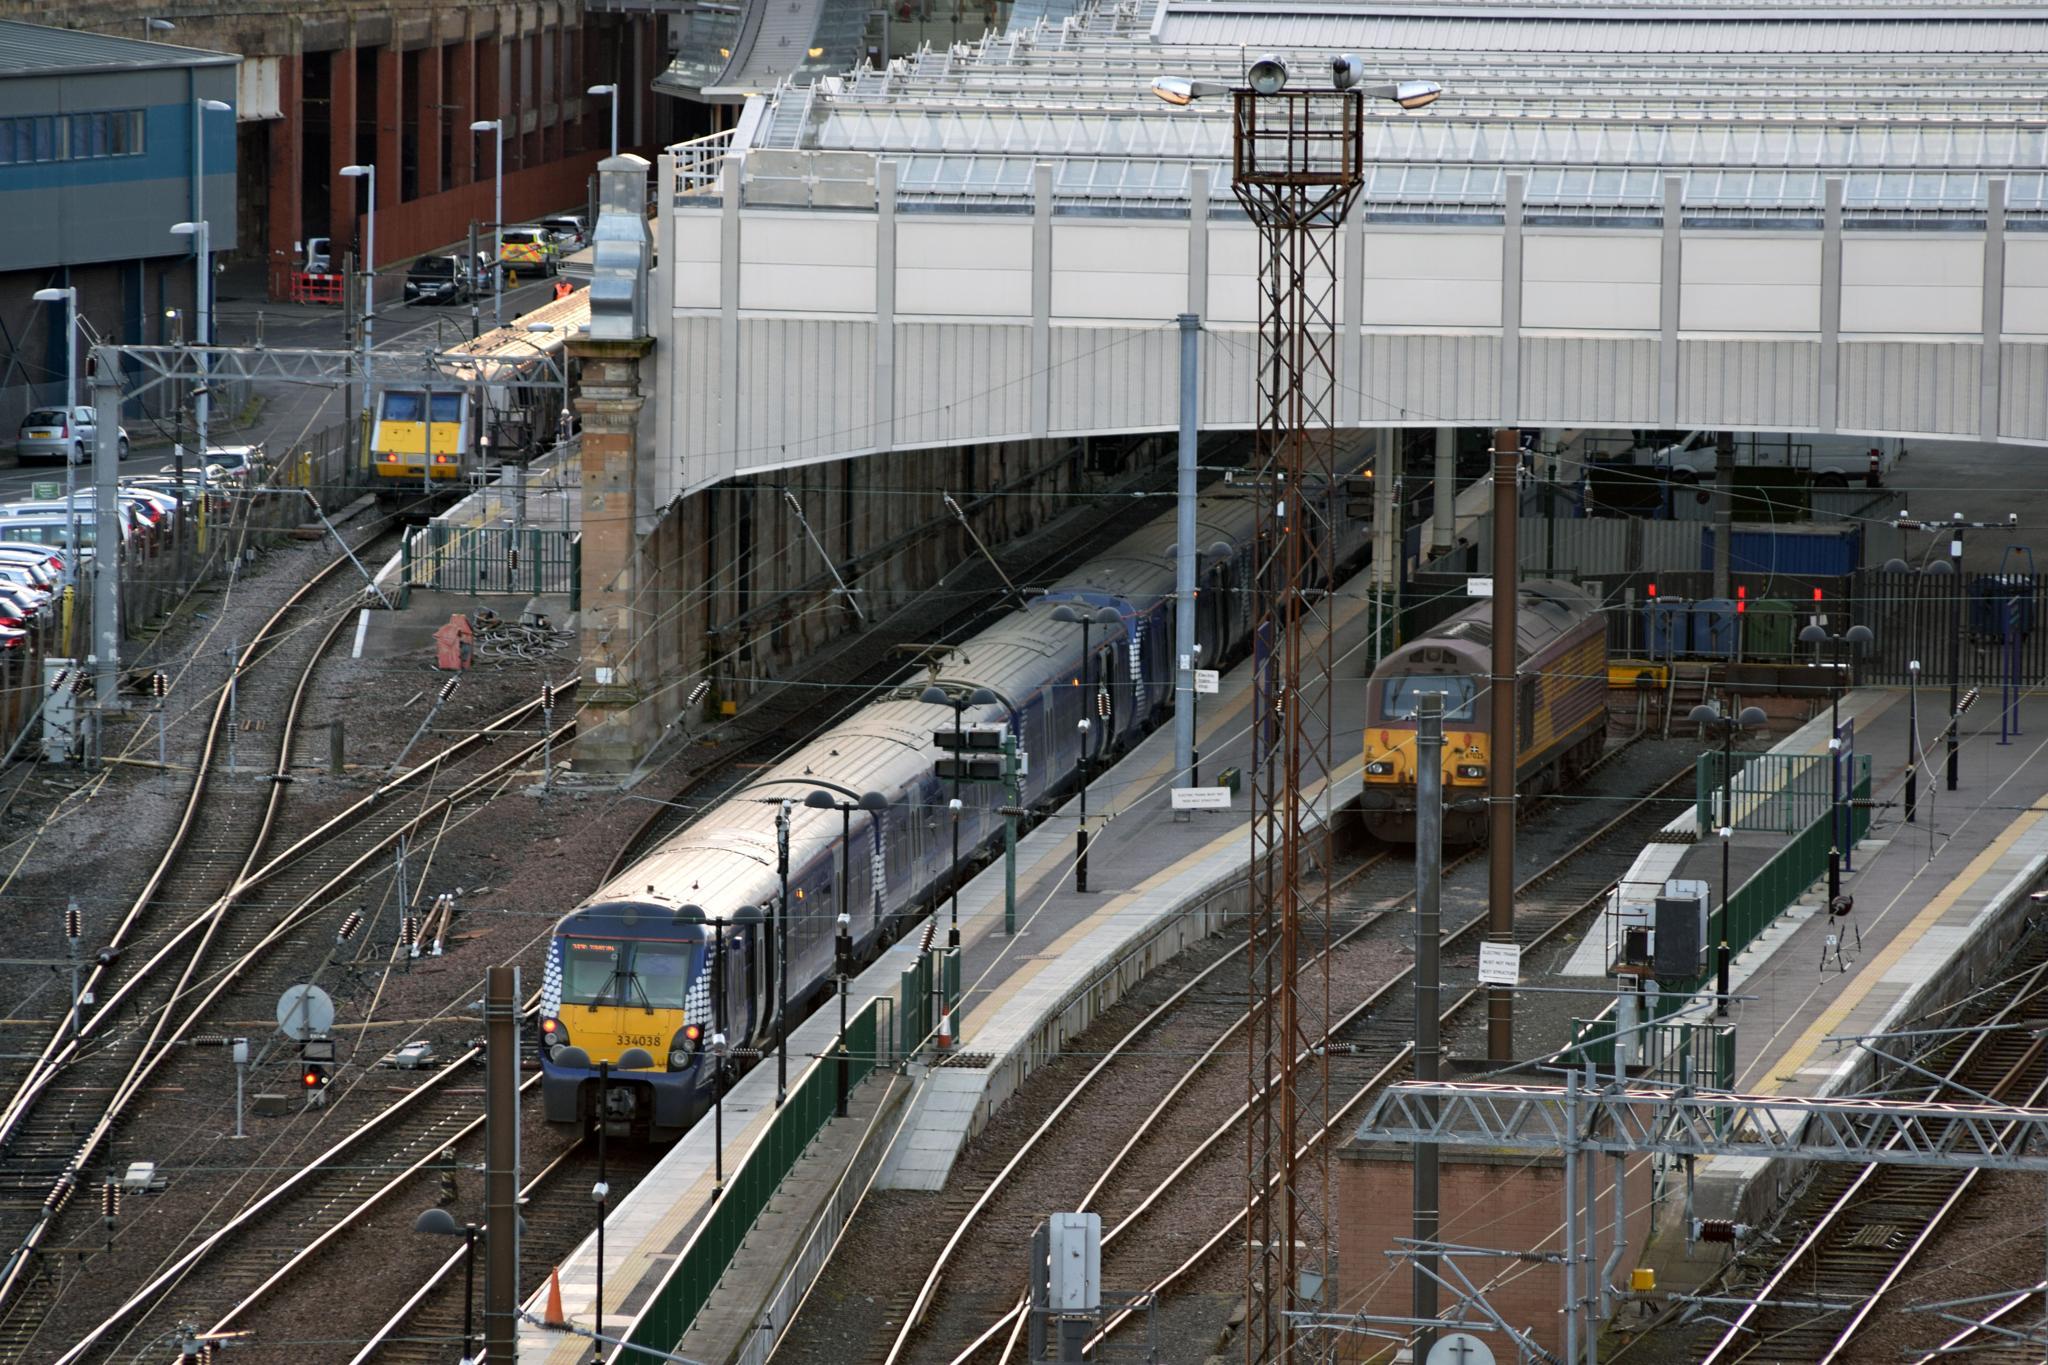 Rear of Waverley station in Edinburgh by gordon40uk